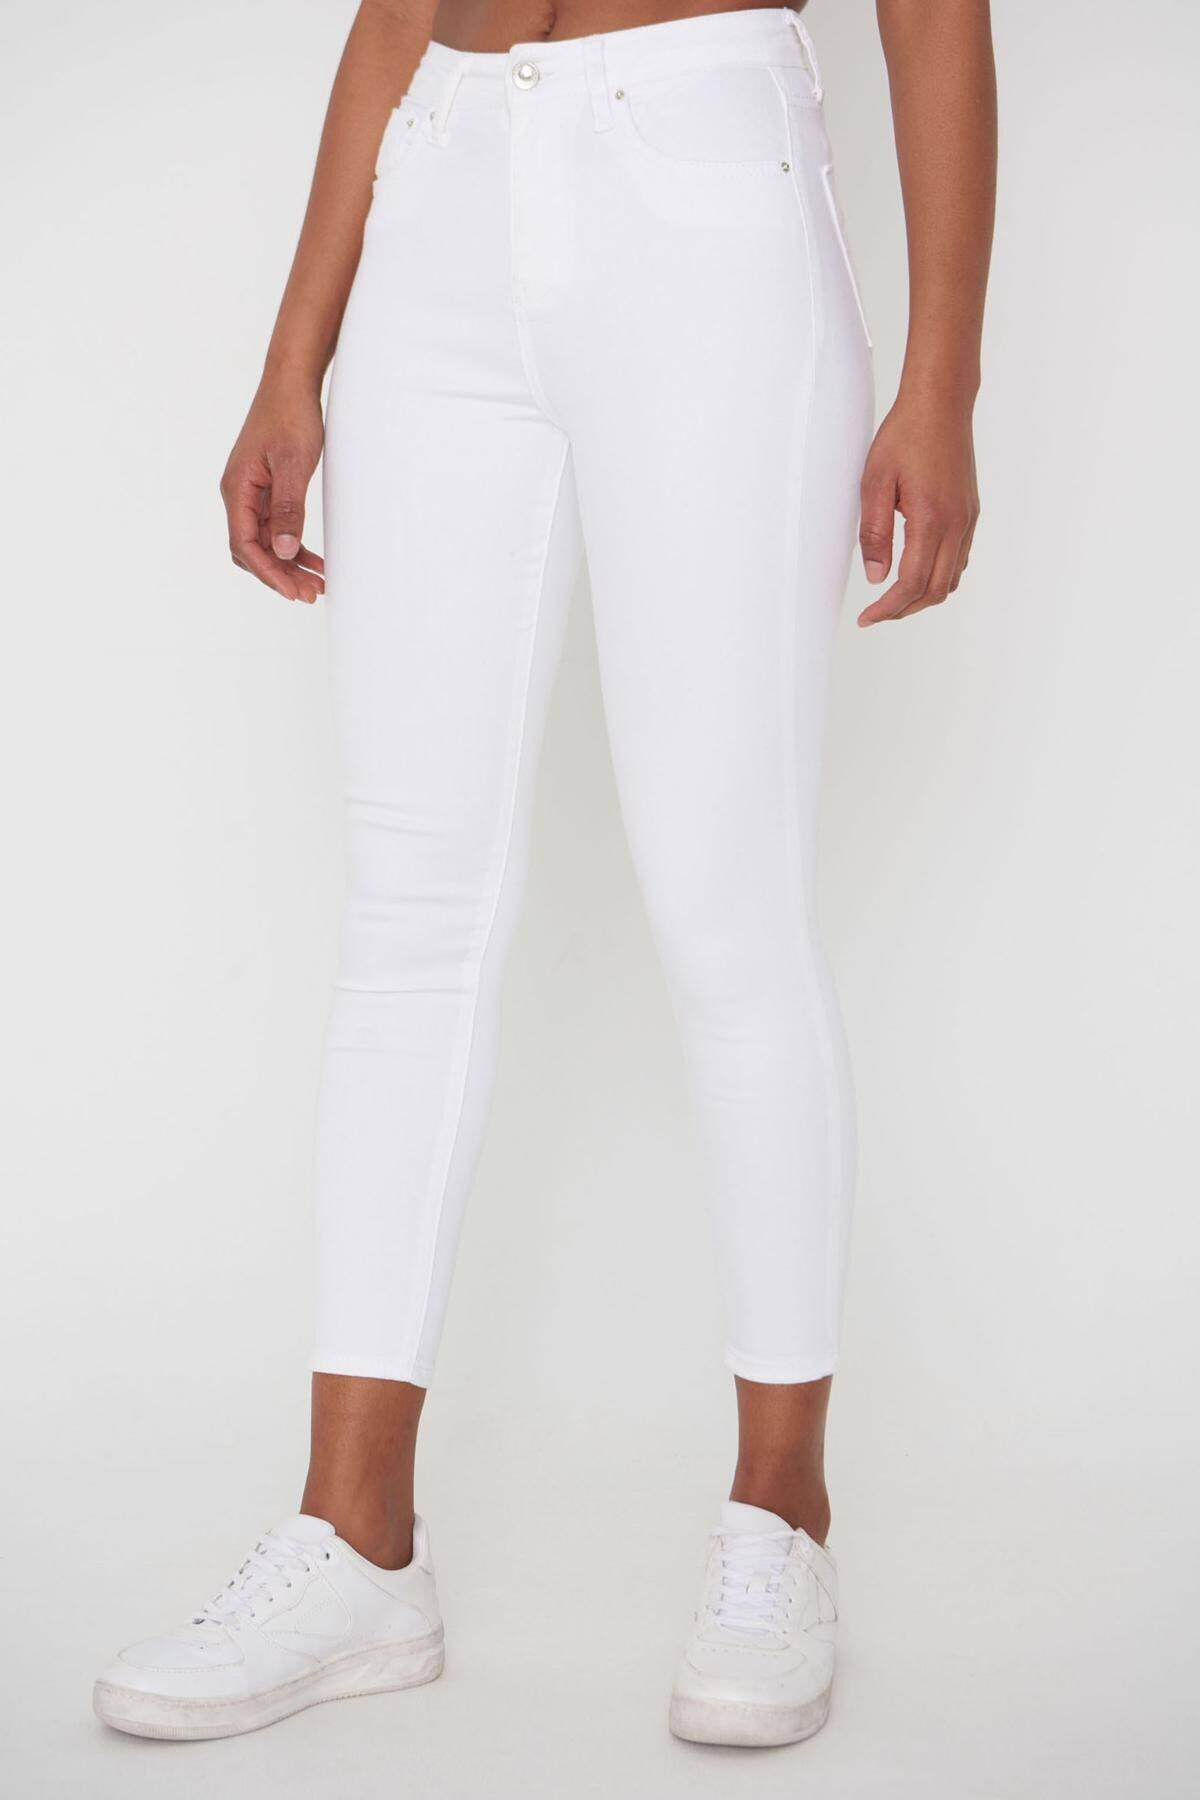 Addax Kadın Beyaz Pantolon Pn4424 - Pnj ADX-00008543 1